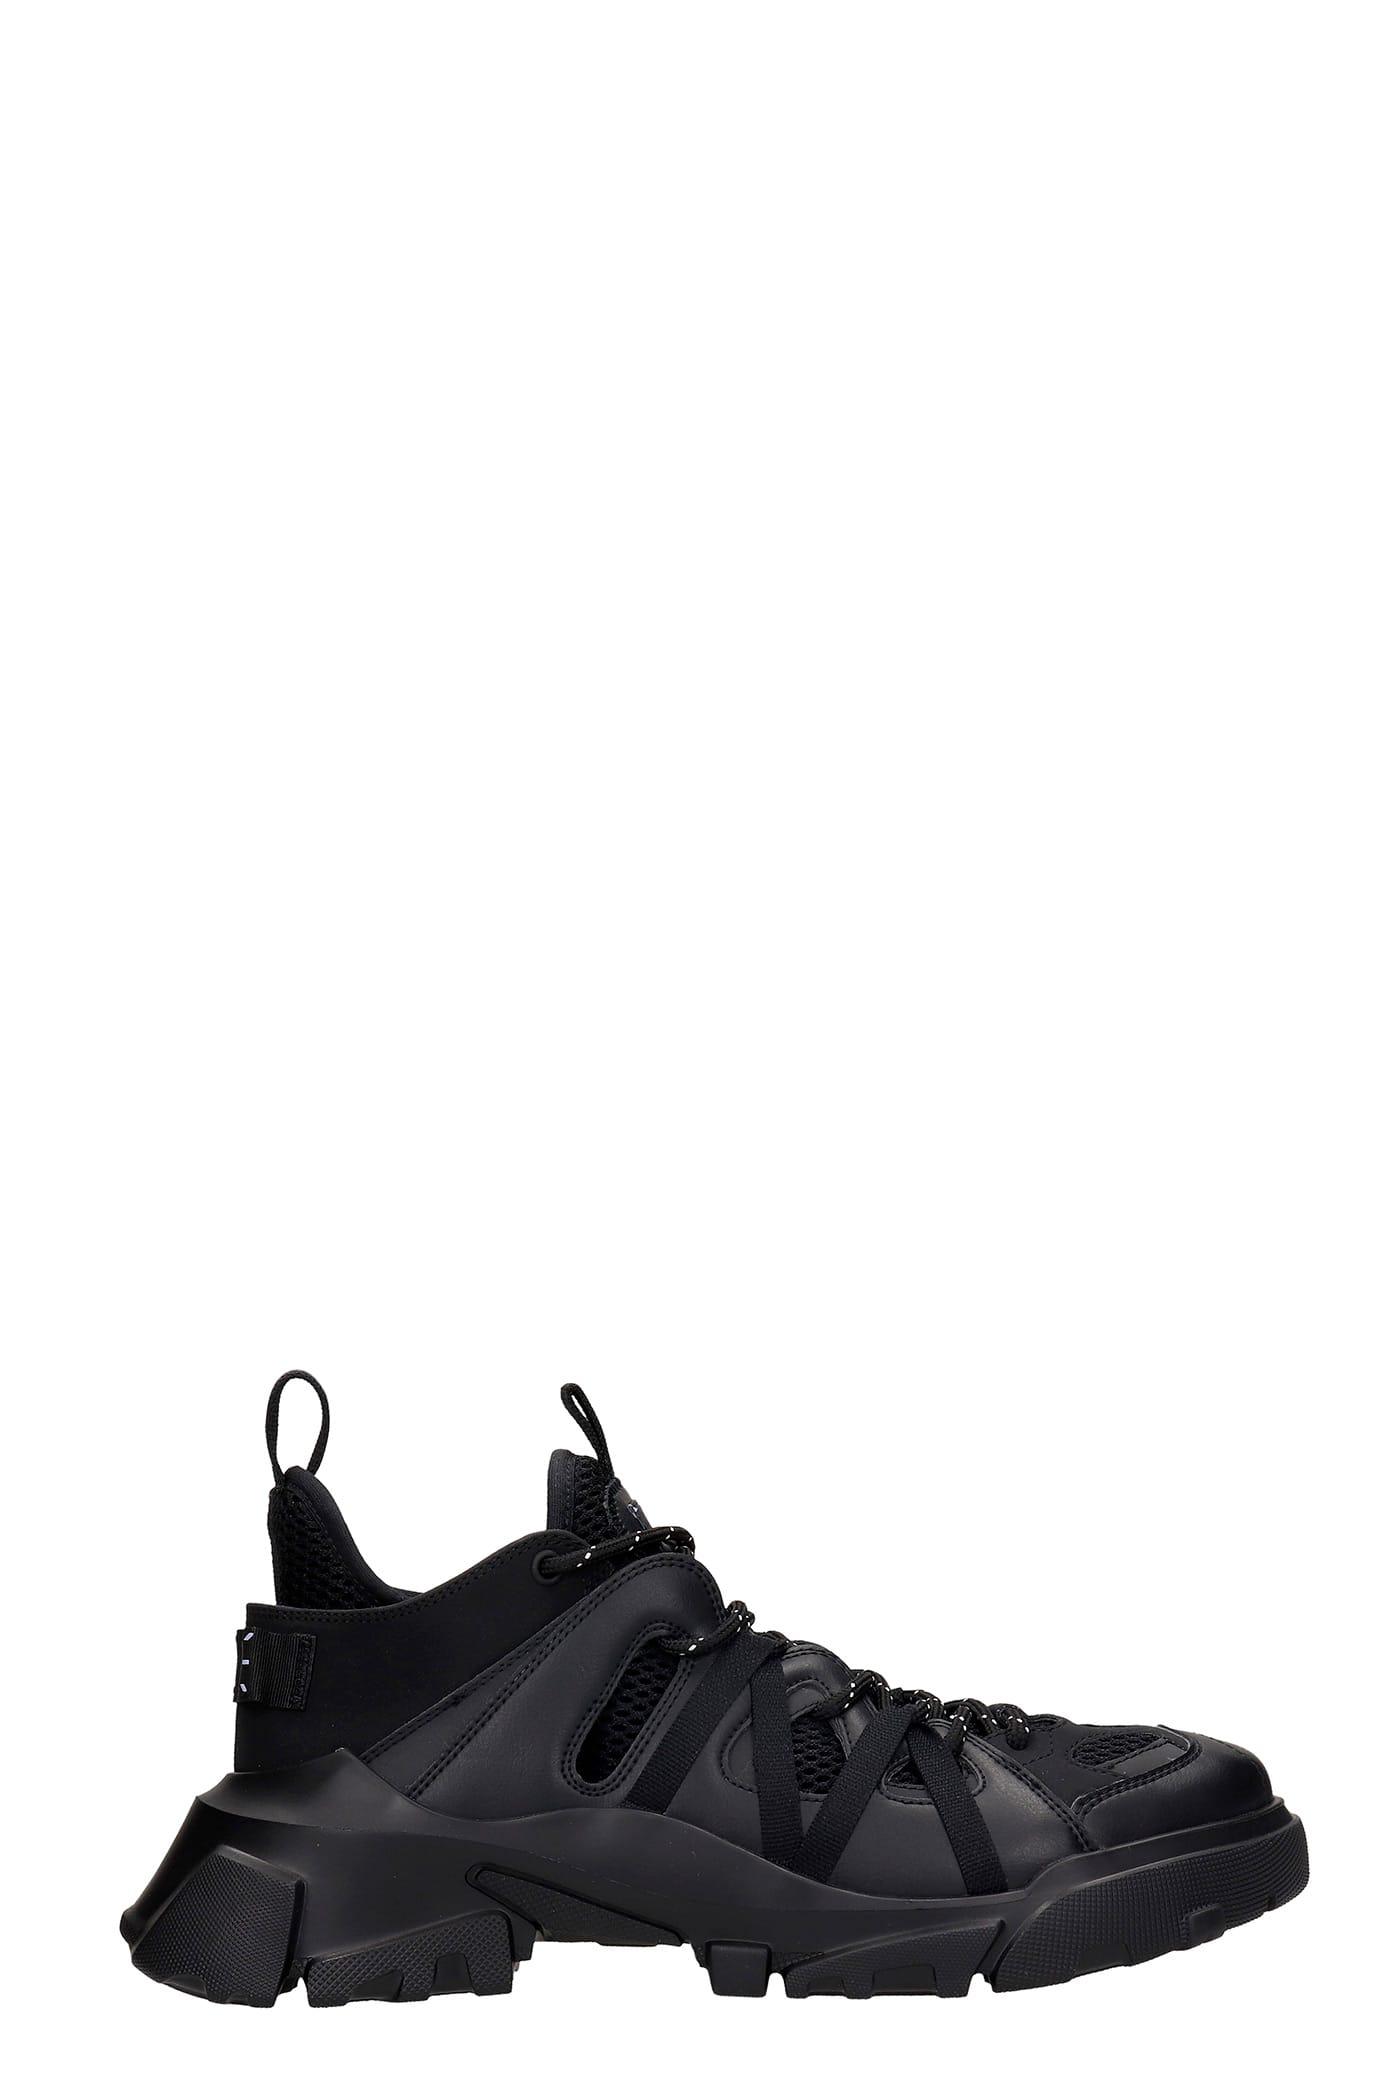 Orby T 2.0 Sneakers In Black Synthetic Fibers